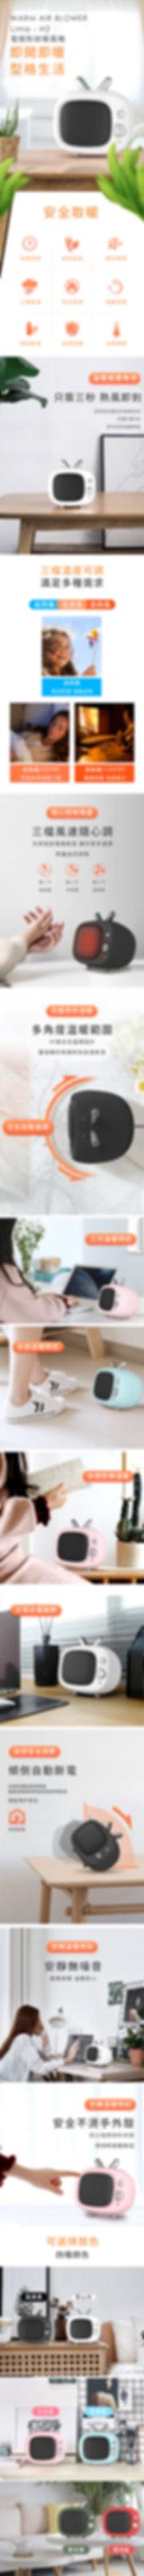 Limo-H2電視形狀暖風機 拷貝.jpg